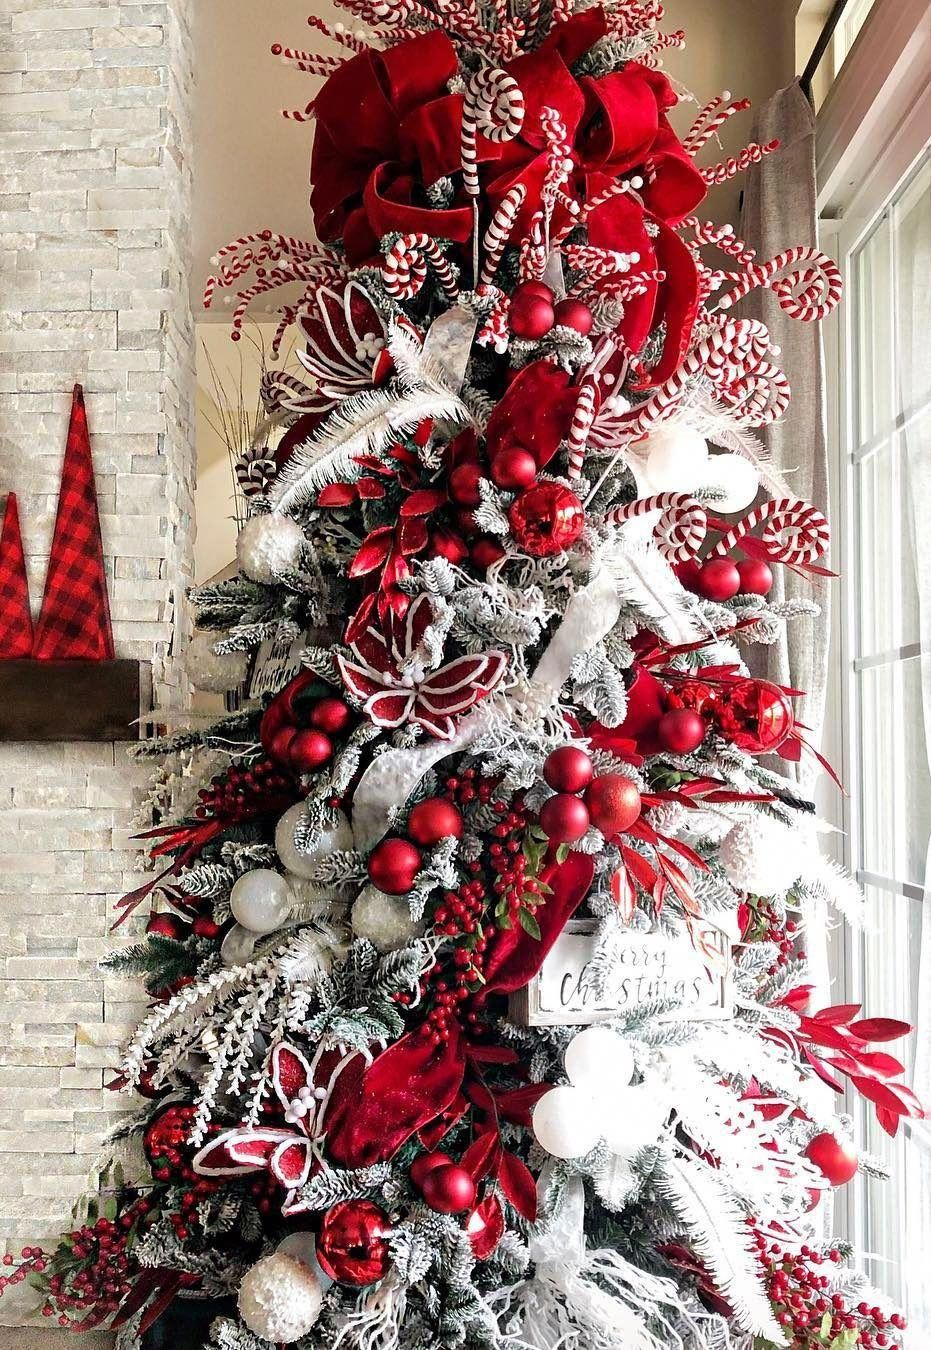 Christmas Decorations Silver Christmas Decorations South Africa Christmasdecoration Christmas Tree Decorations Cool Christmas Trees Christmas Tree Inspiration